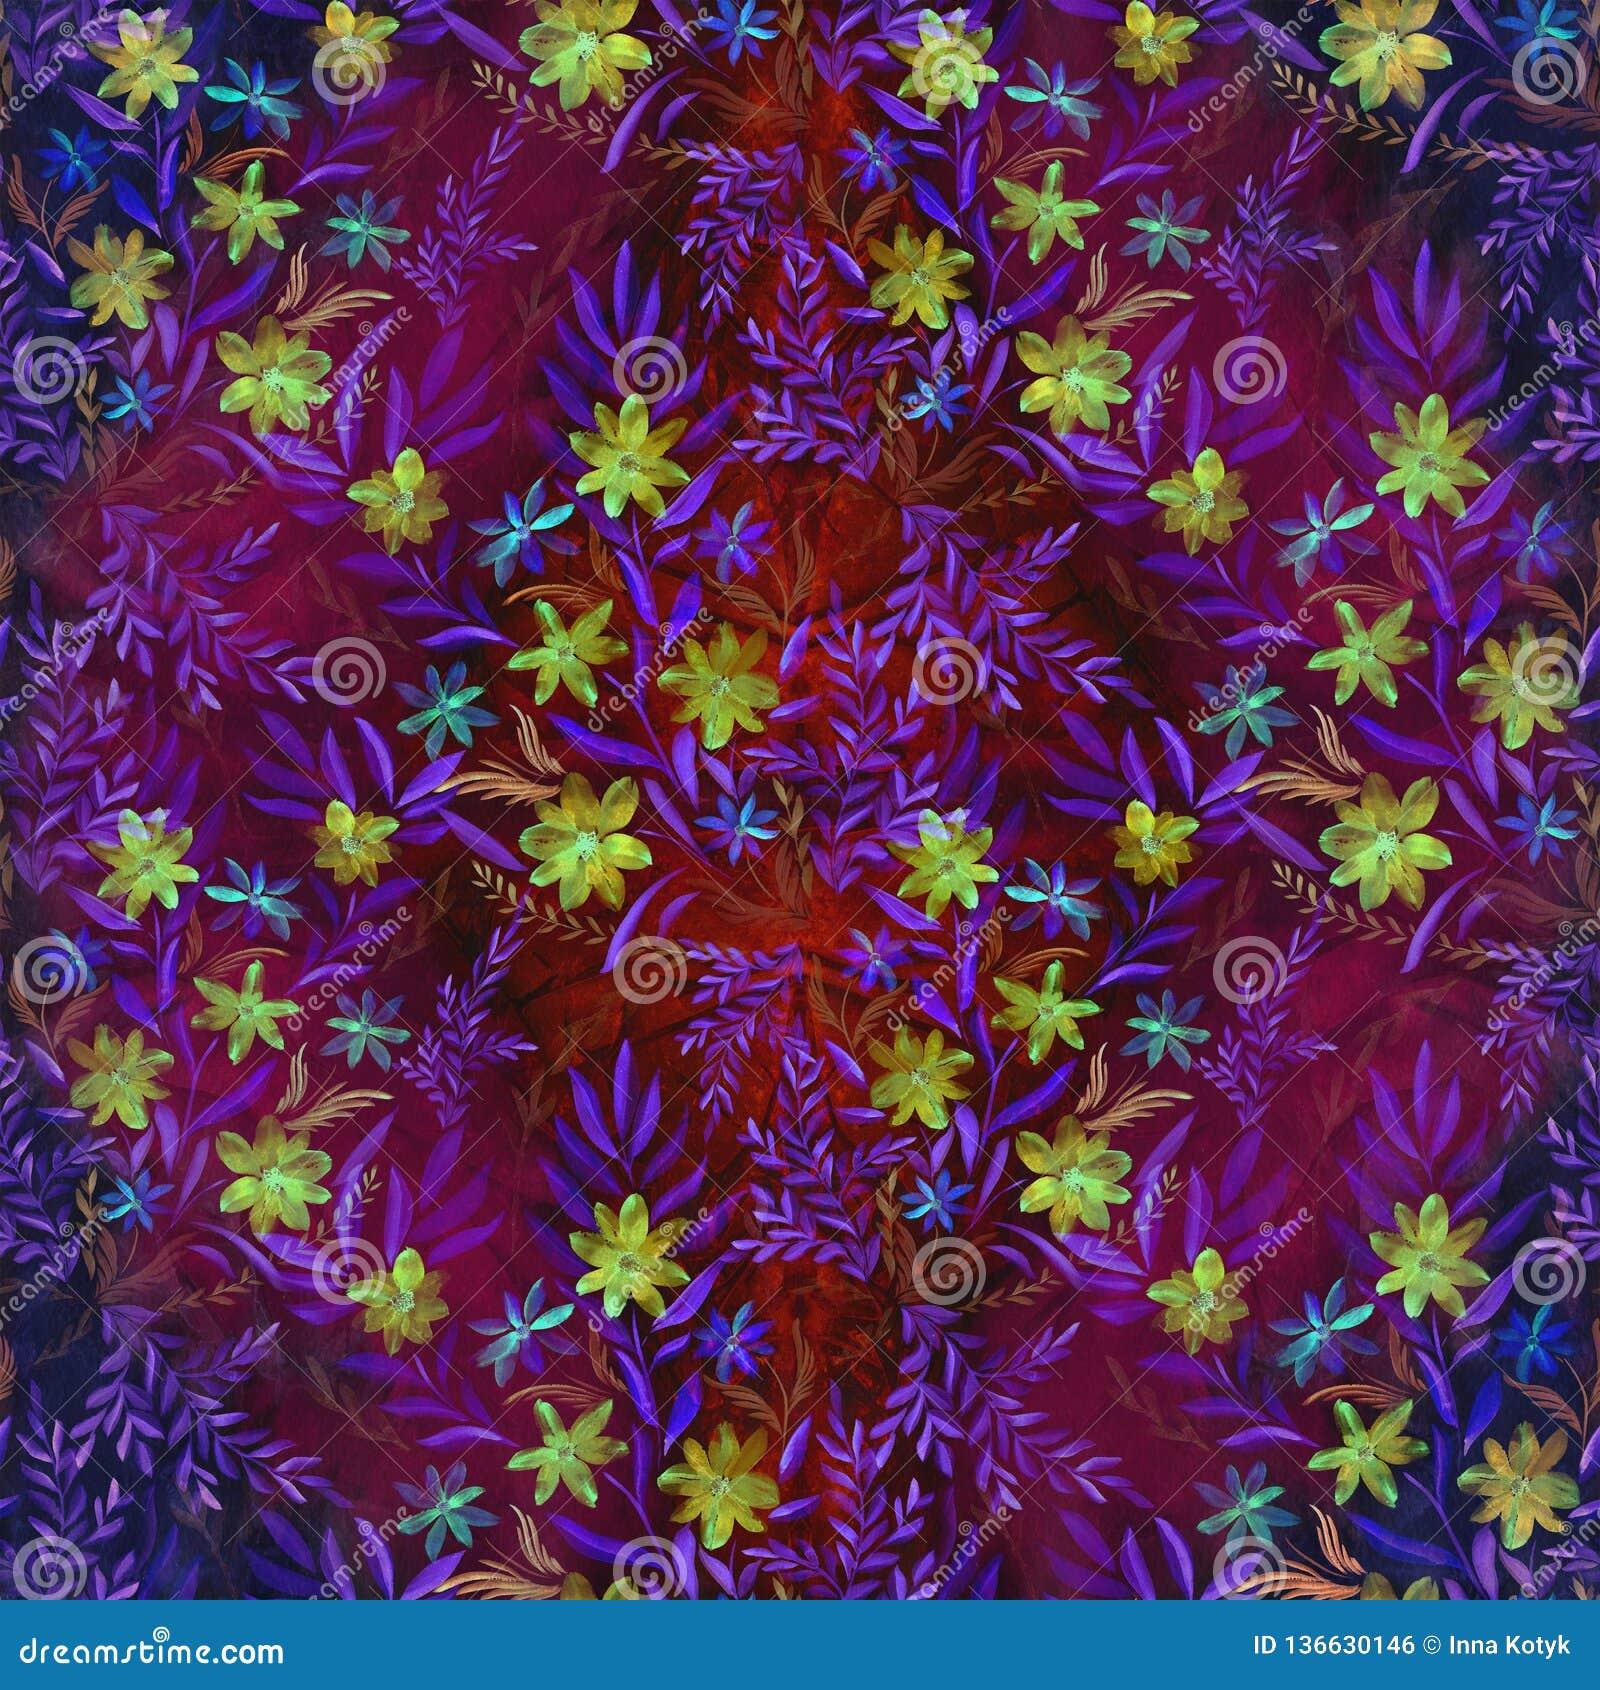 Watercolor Flores en un fondo de la acuarela Papel pintado abstracto con adornos florales Modelo inconsútil